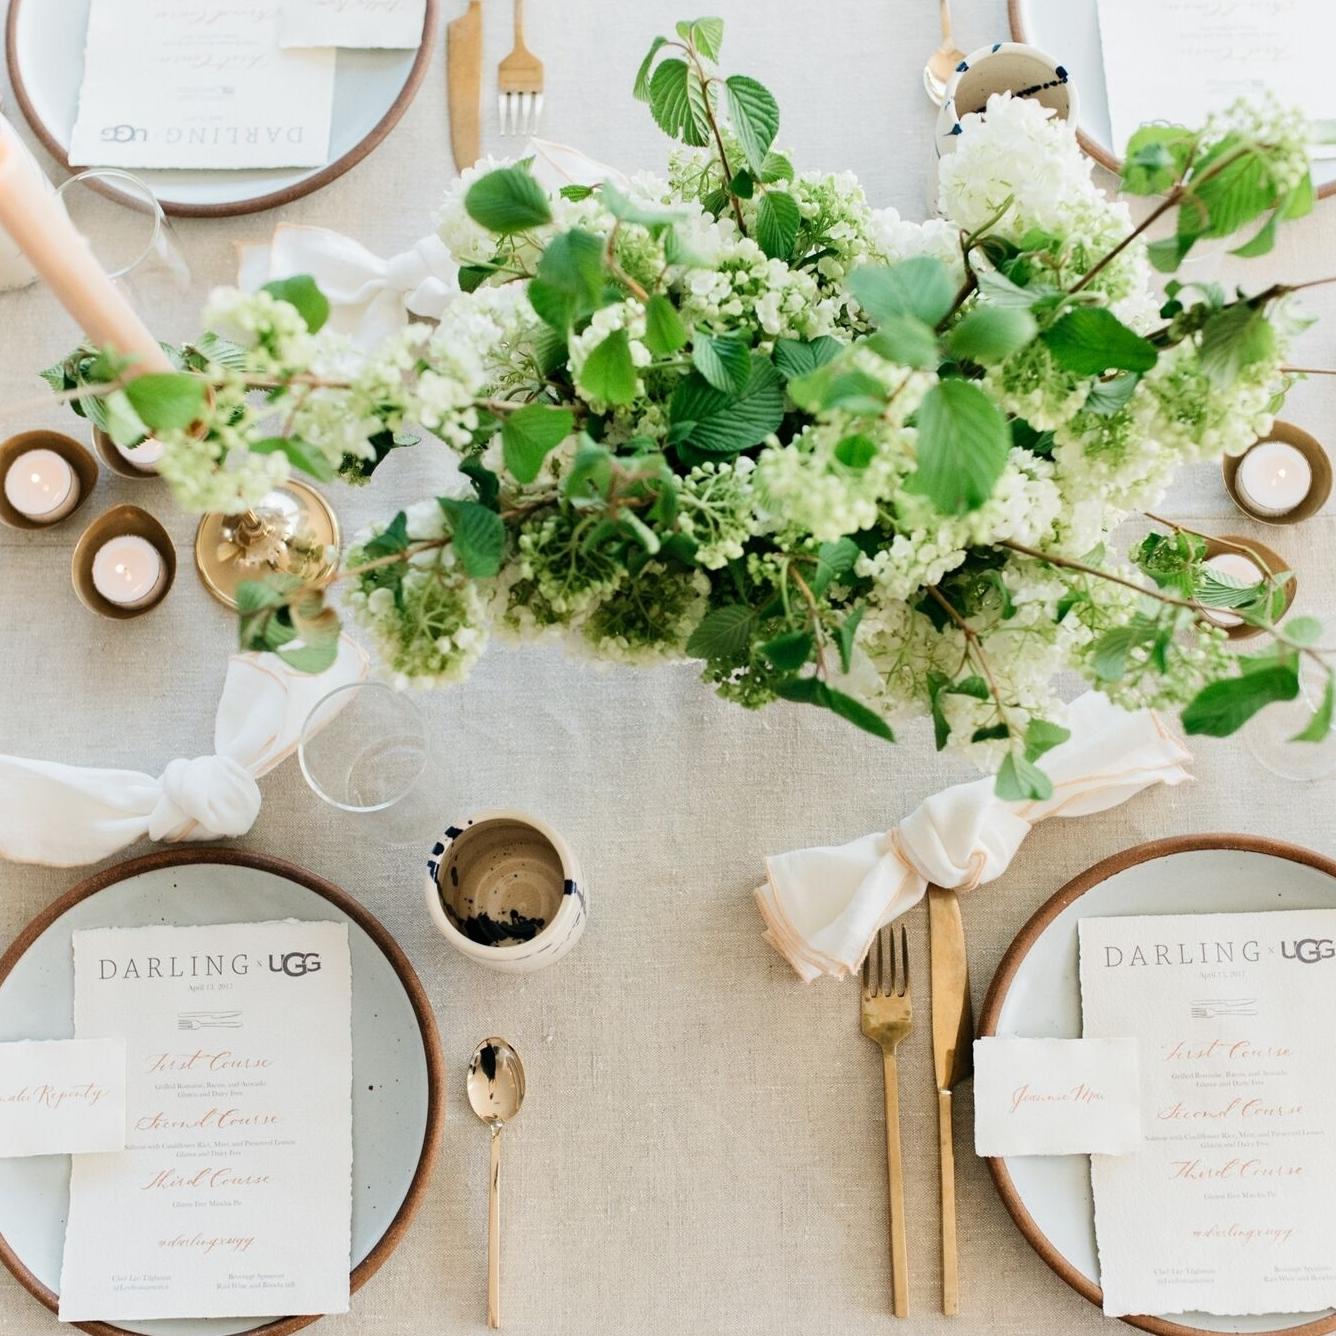 DARLING X UGG Dinner, Darling Magazine  I  Coordination,Flowers, Design:  Chelsea Carter Events I  Photographer : Cara Robbins